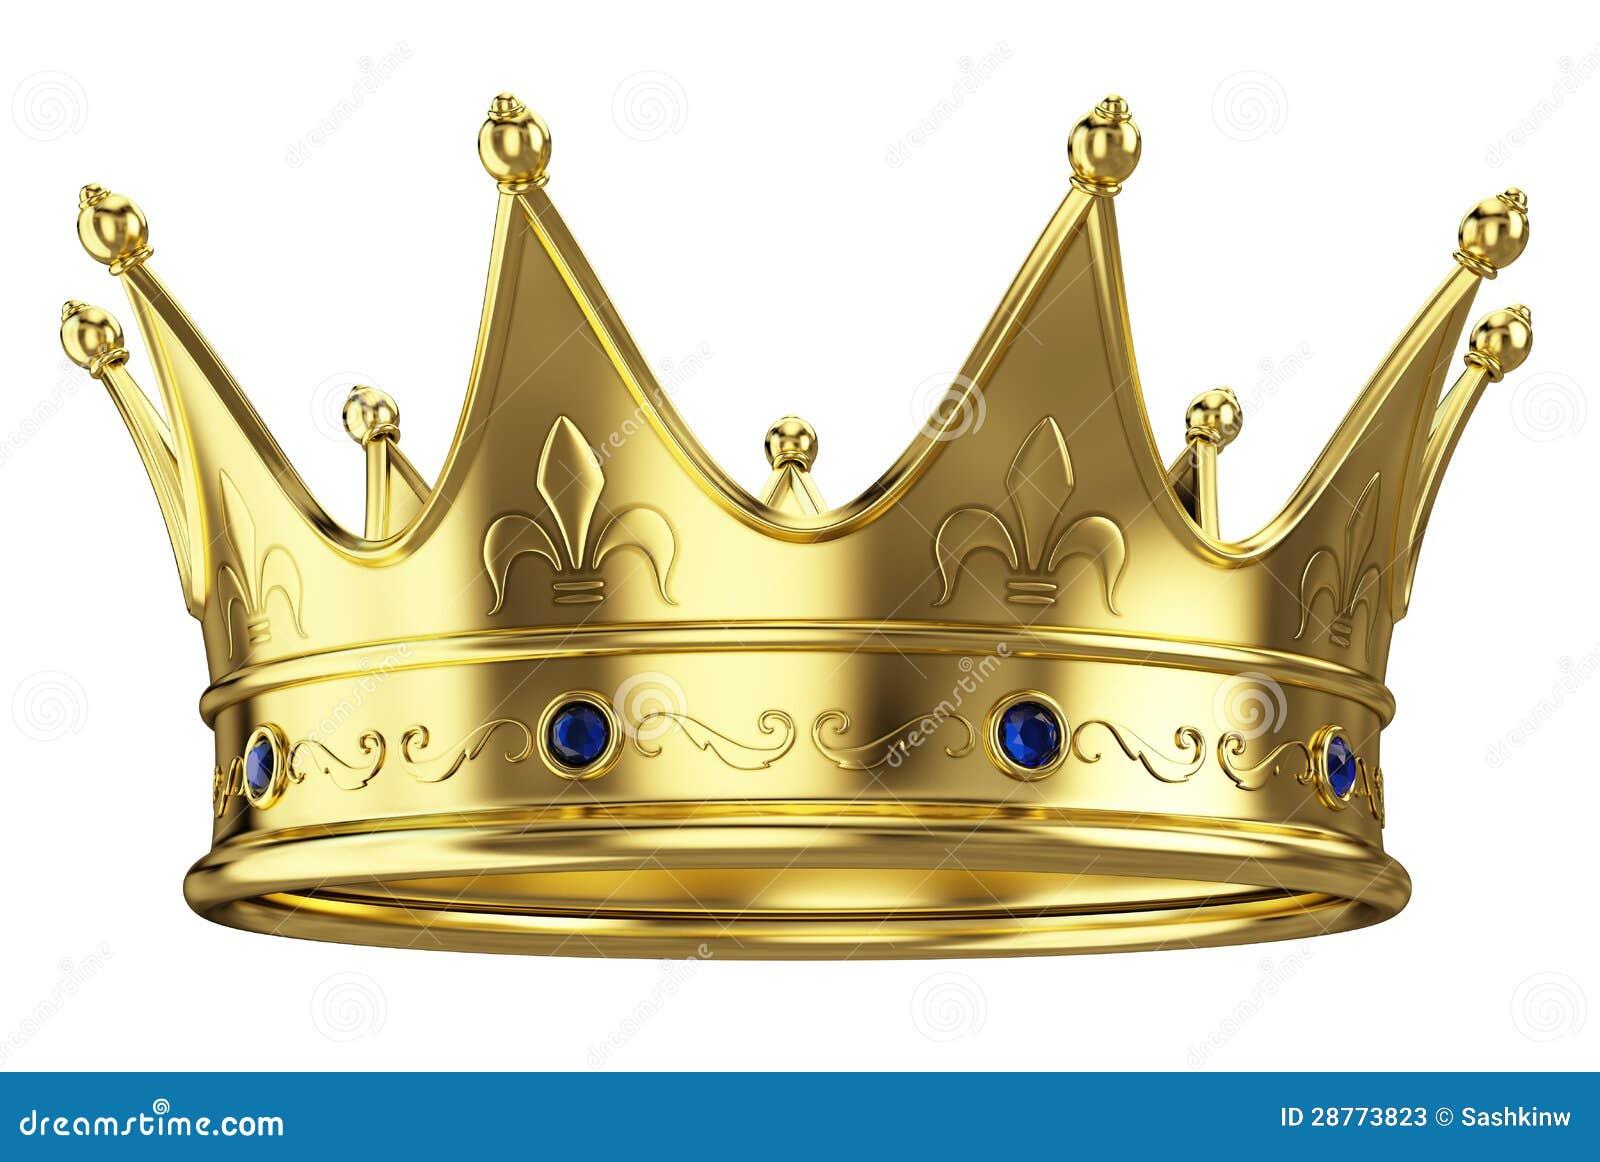 Gold Crown Stock Photos - Image: 28773823